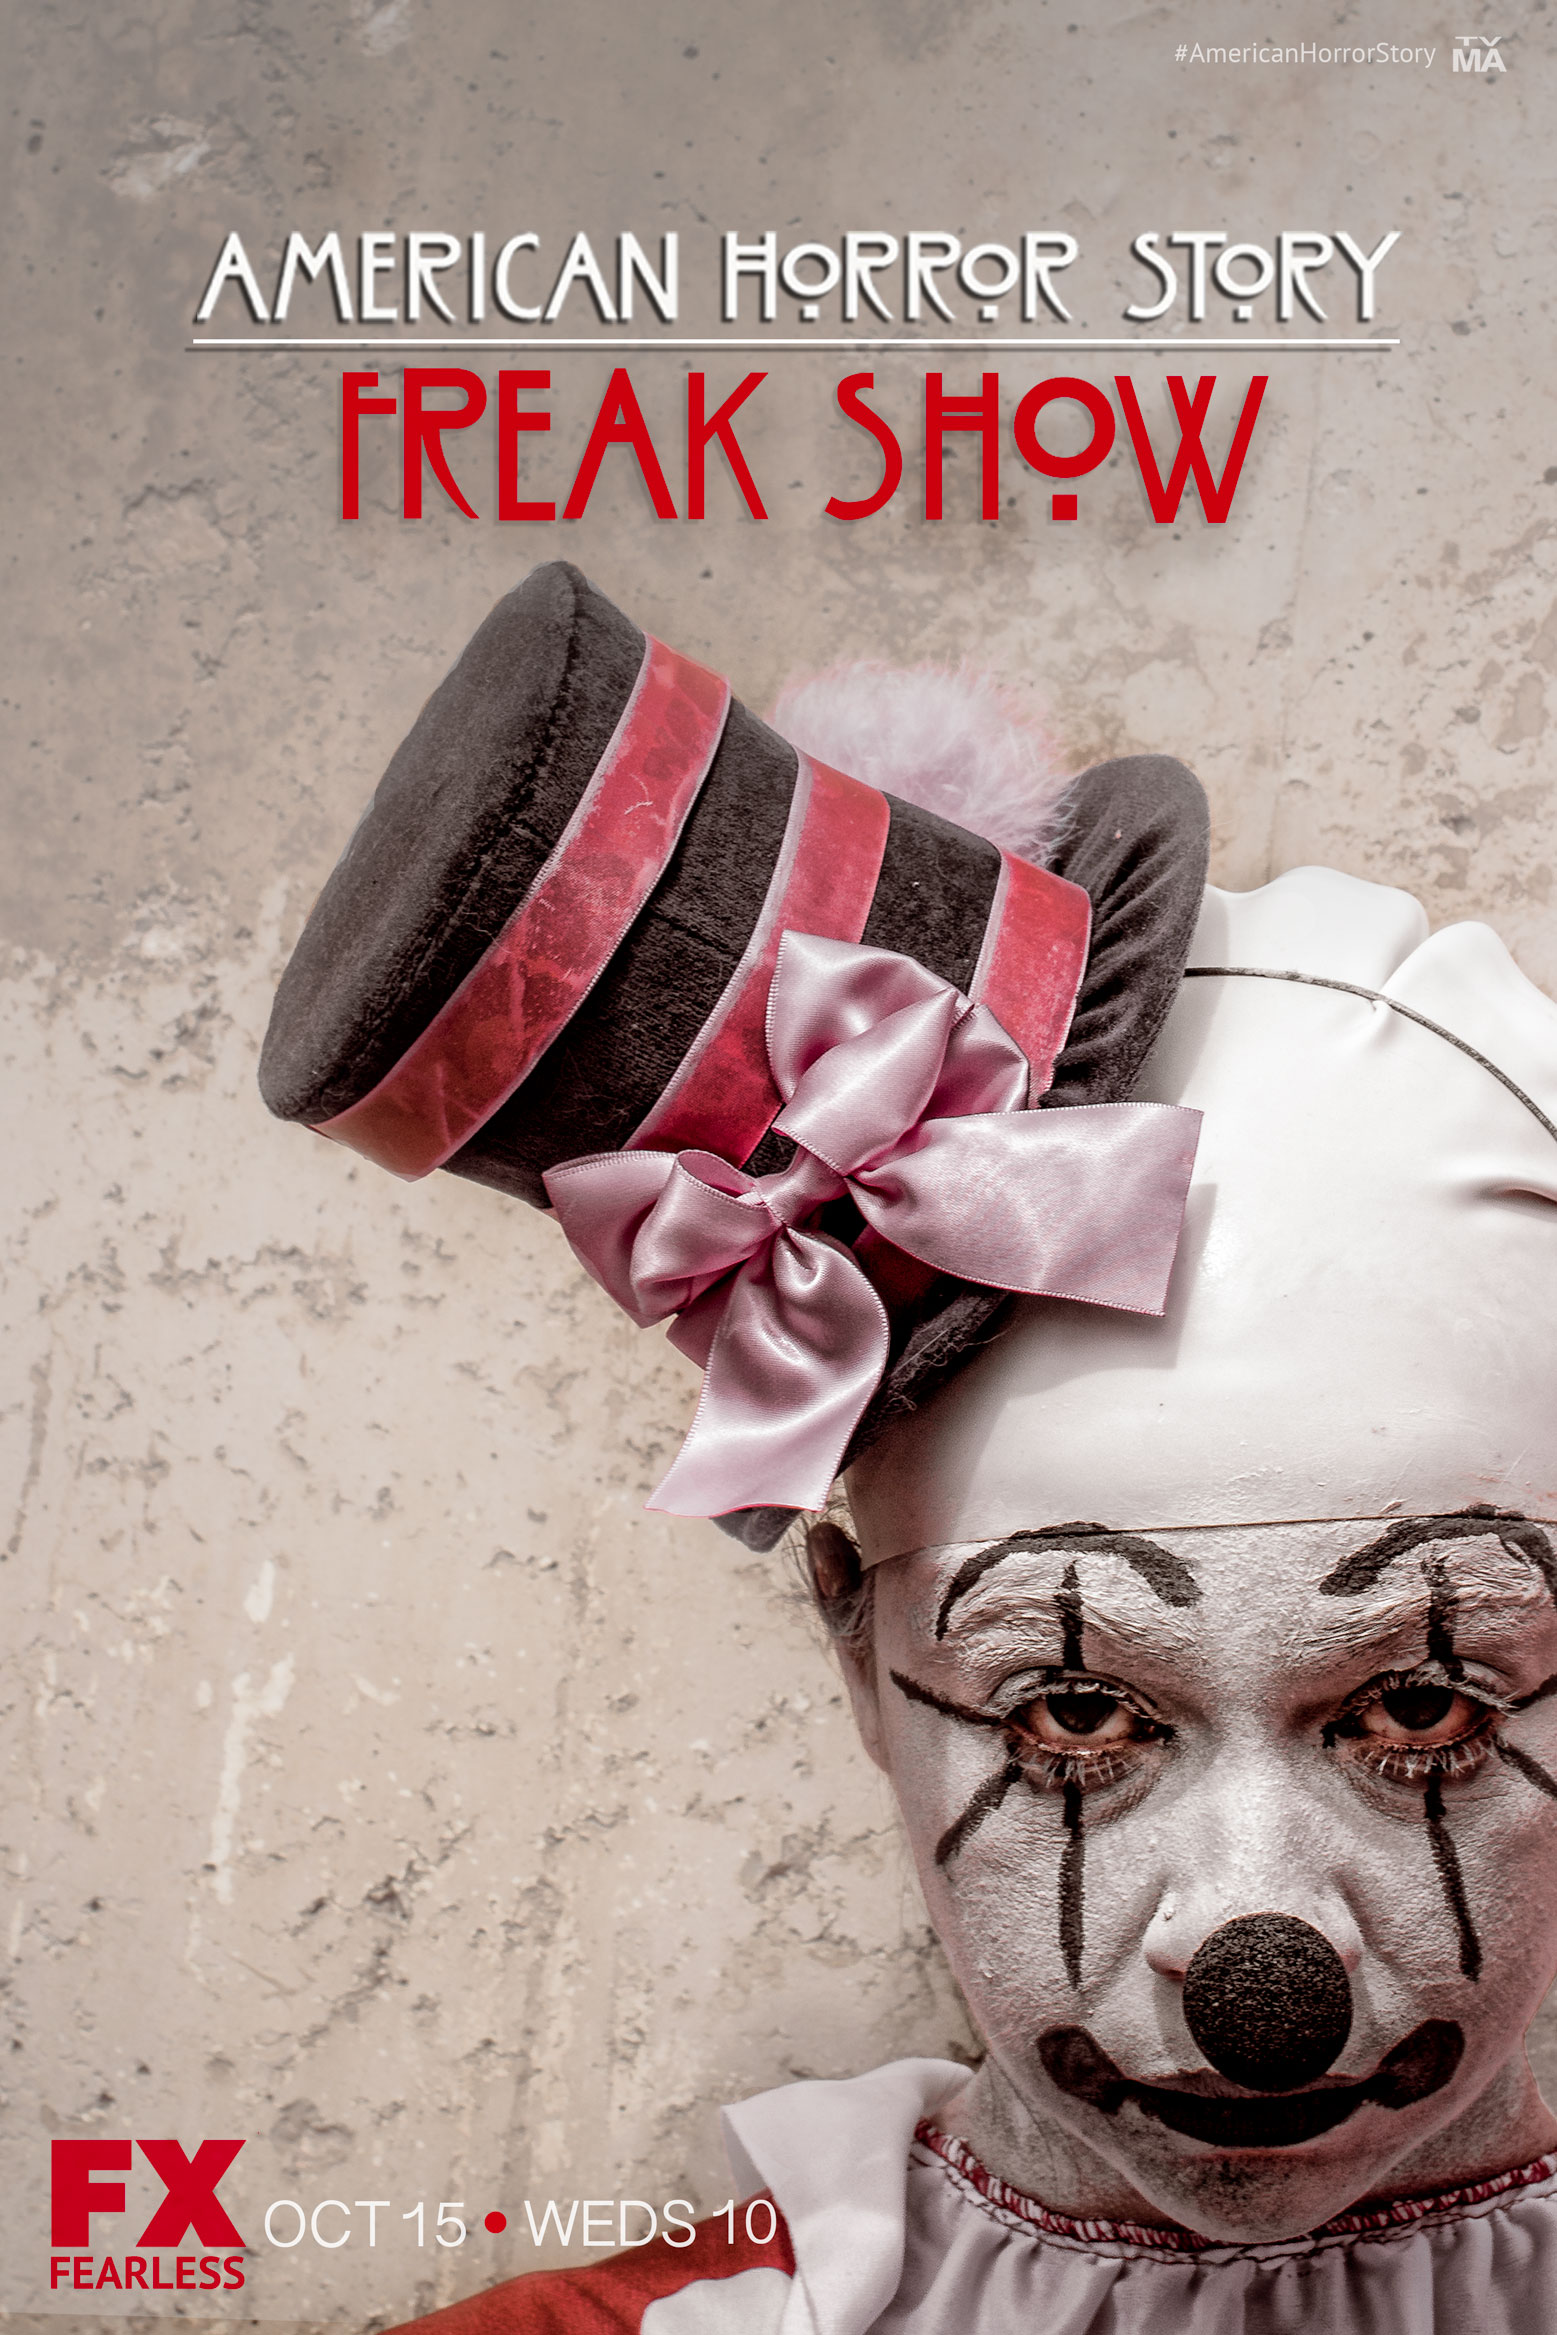 American Horror Story - Freak Show 001.jpg